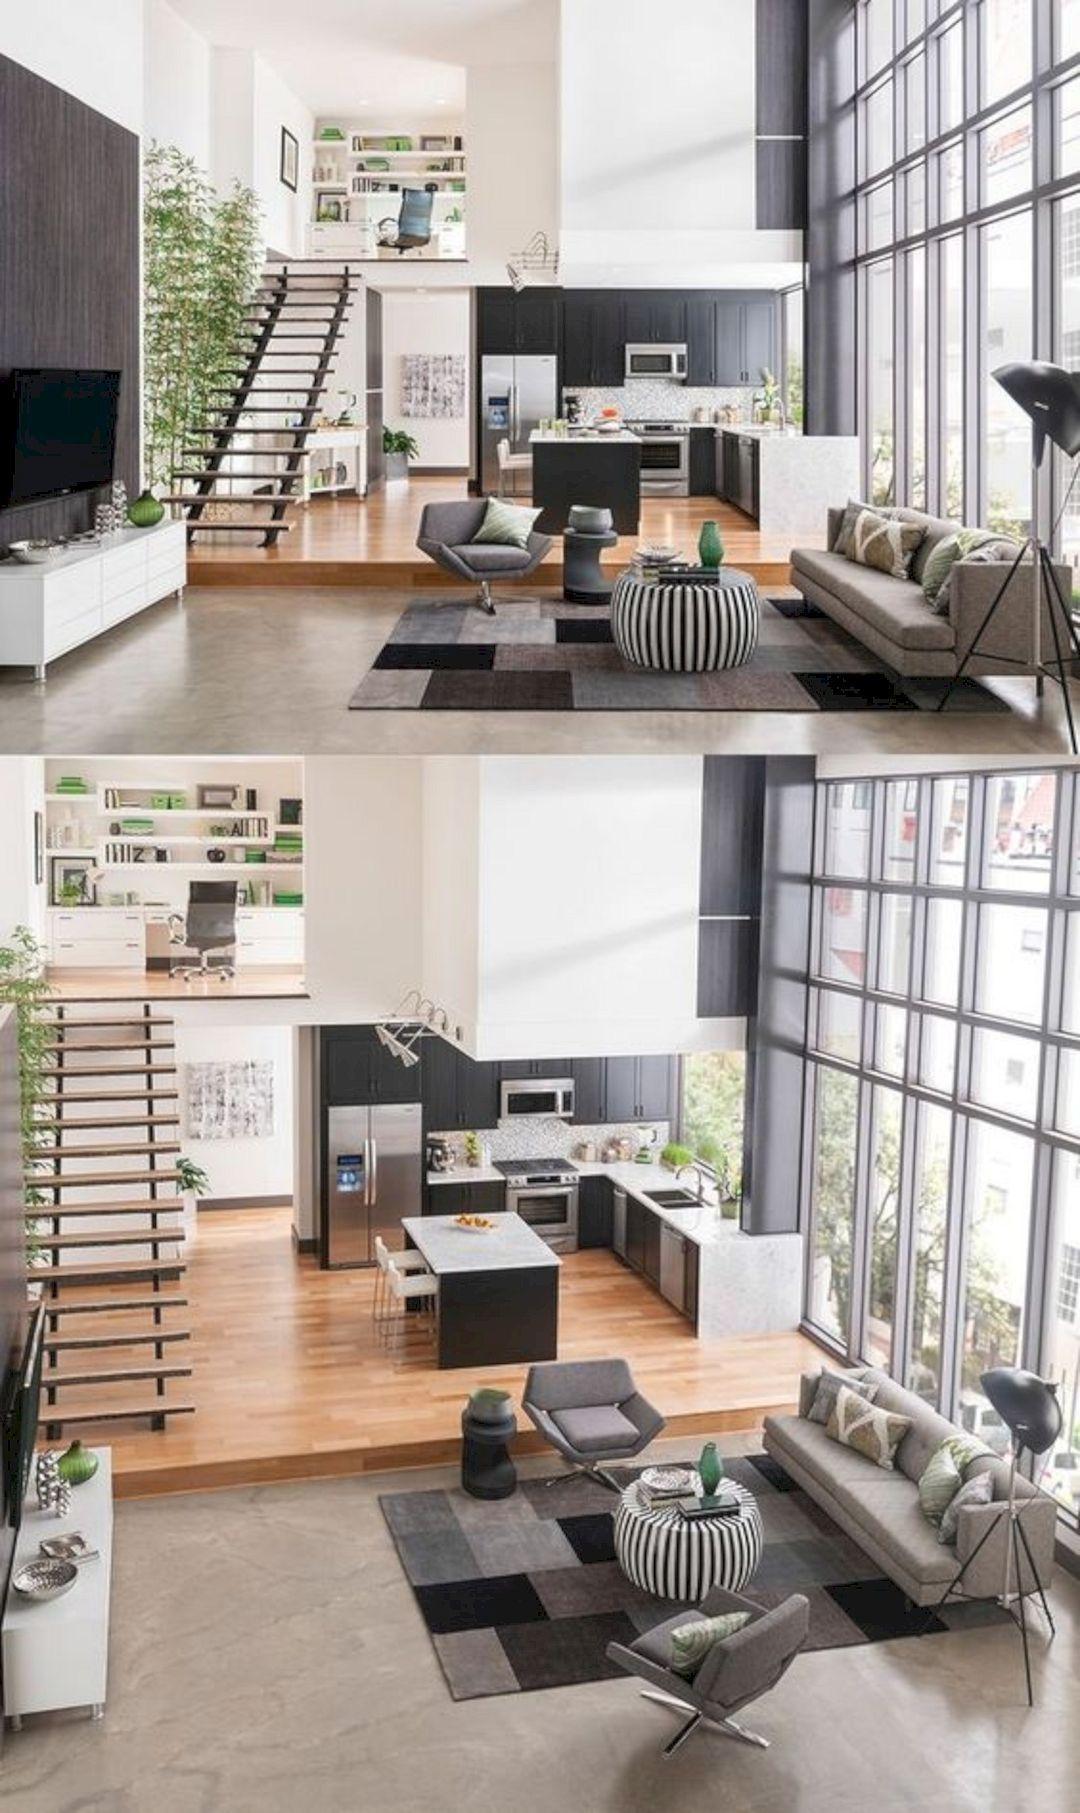 15 Amazing Interior Design Ideas For Modern Loft House Interior